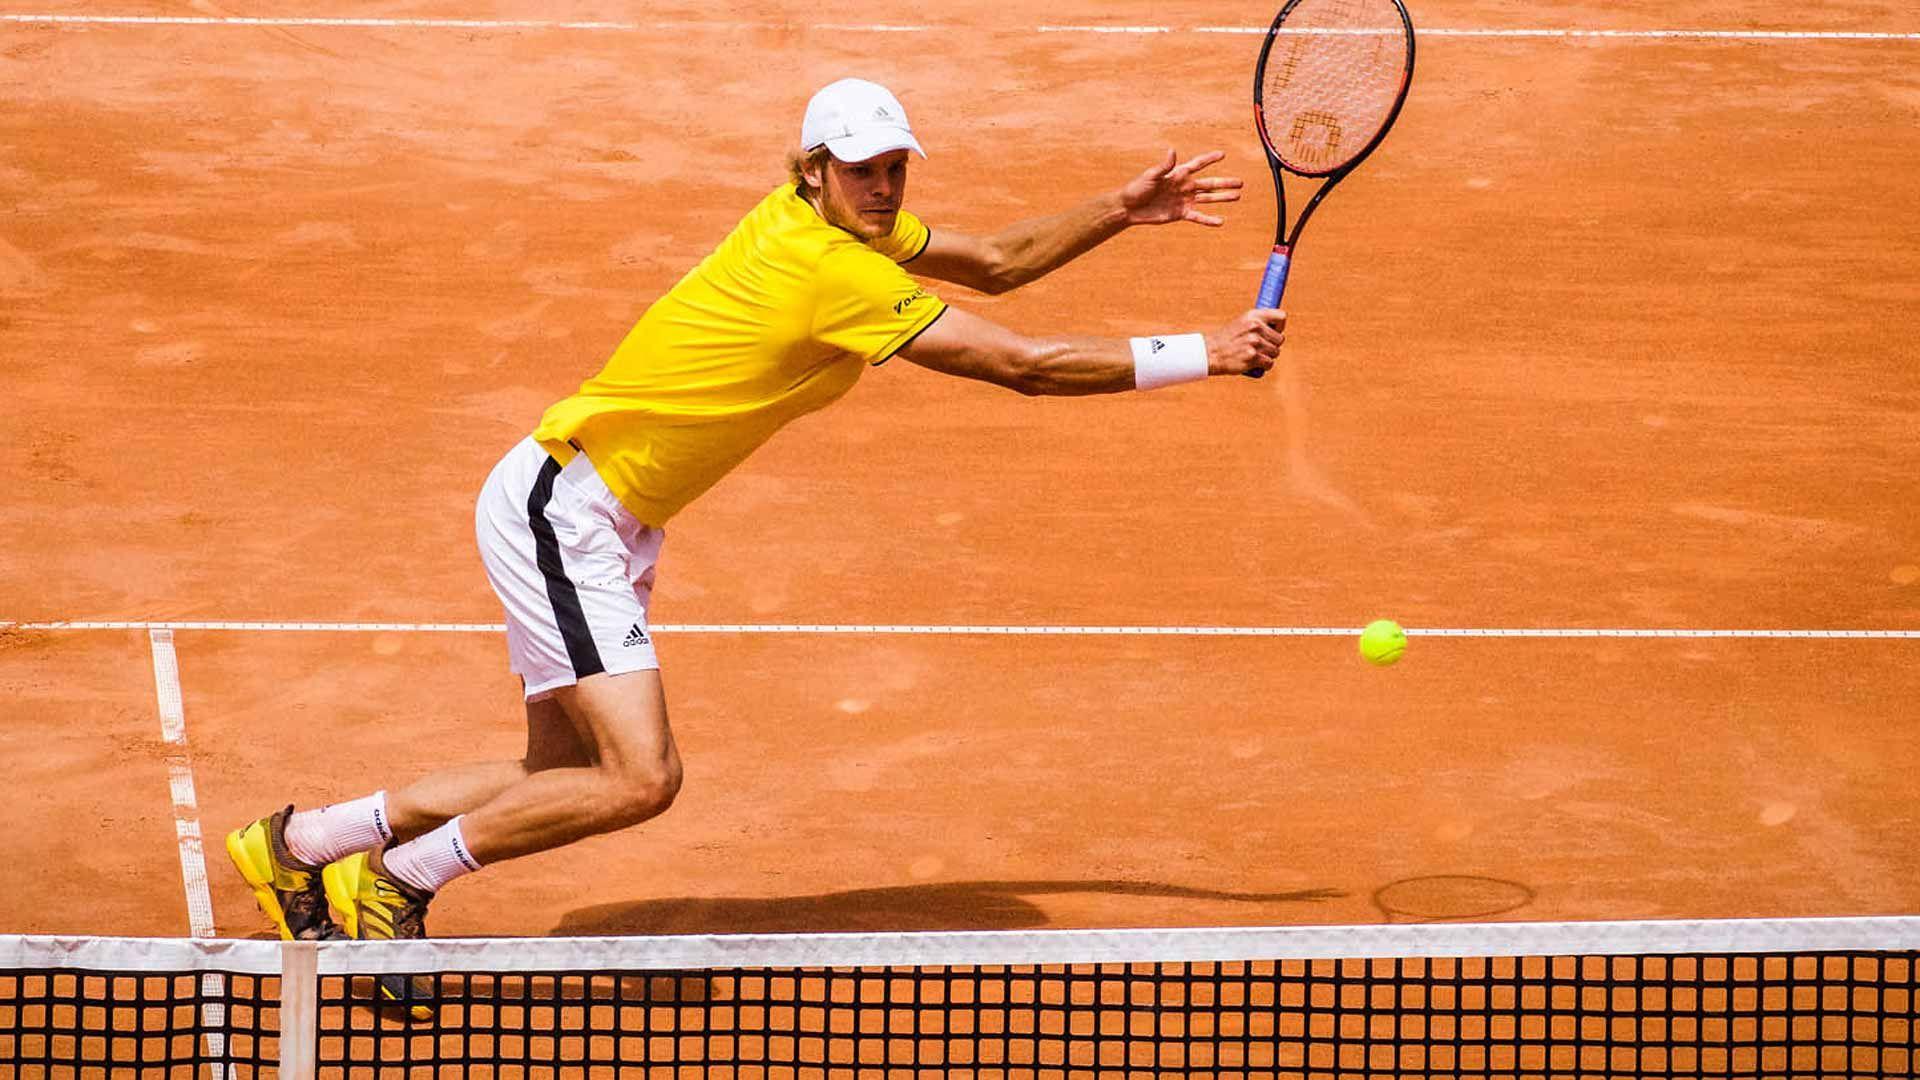 Картинки большого тенниса (39 фото) ⭐ Забавник Теннис